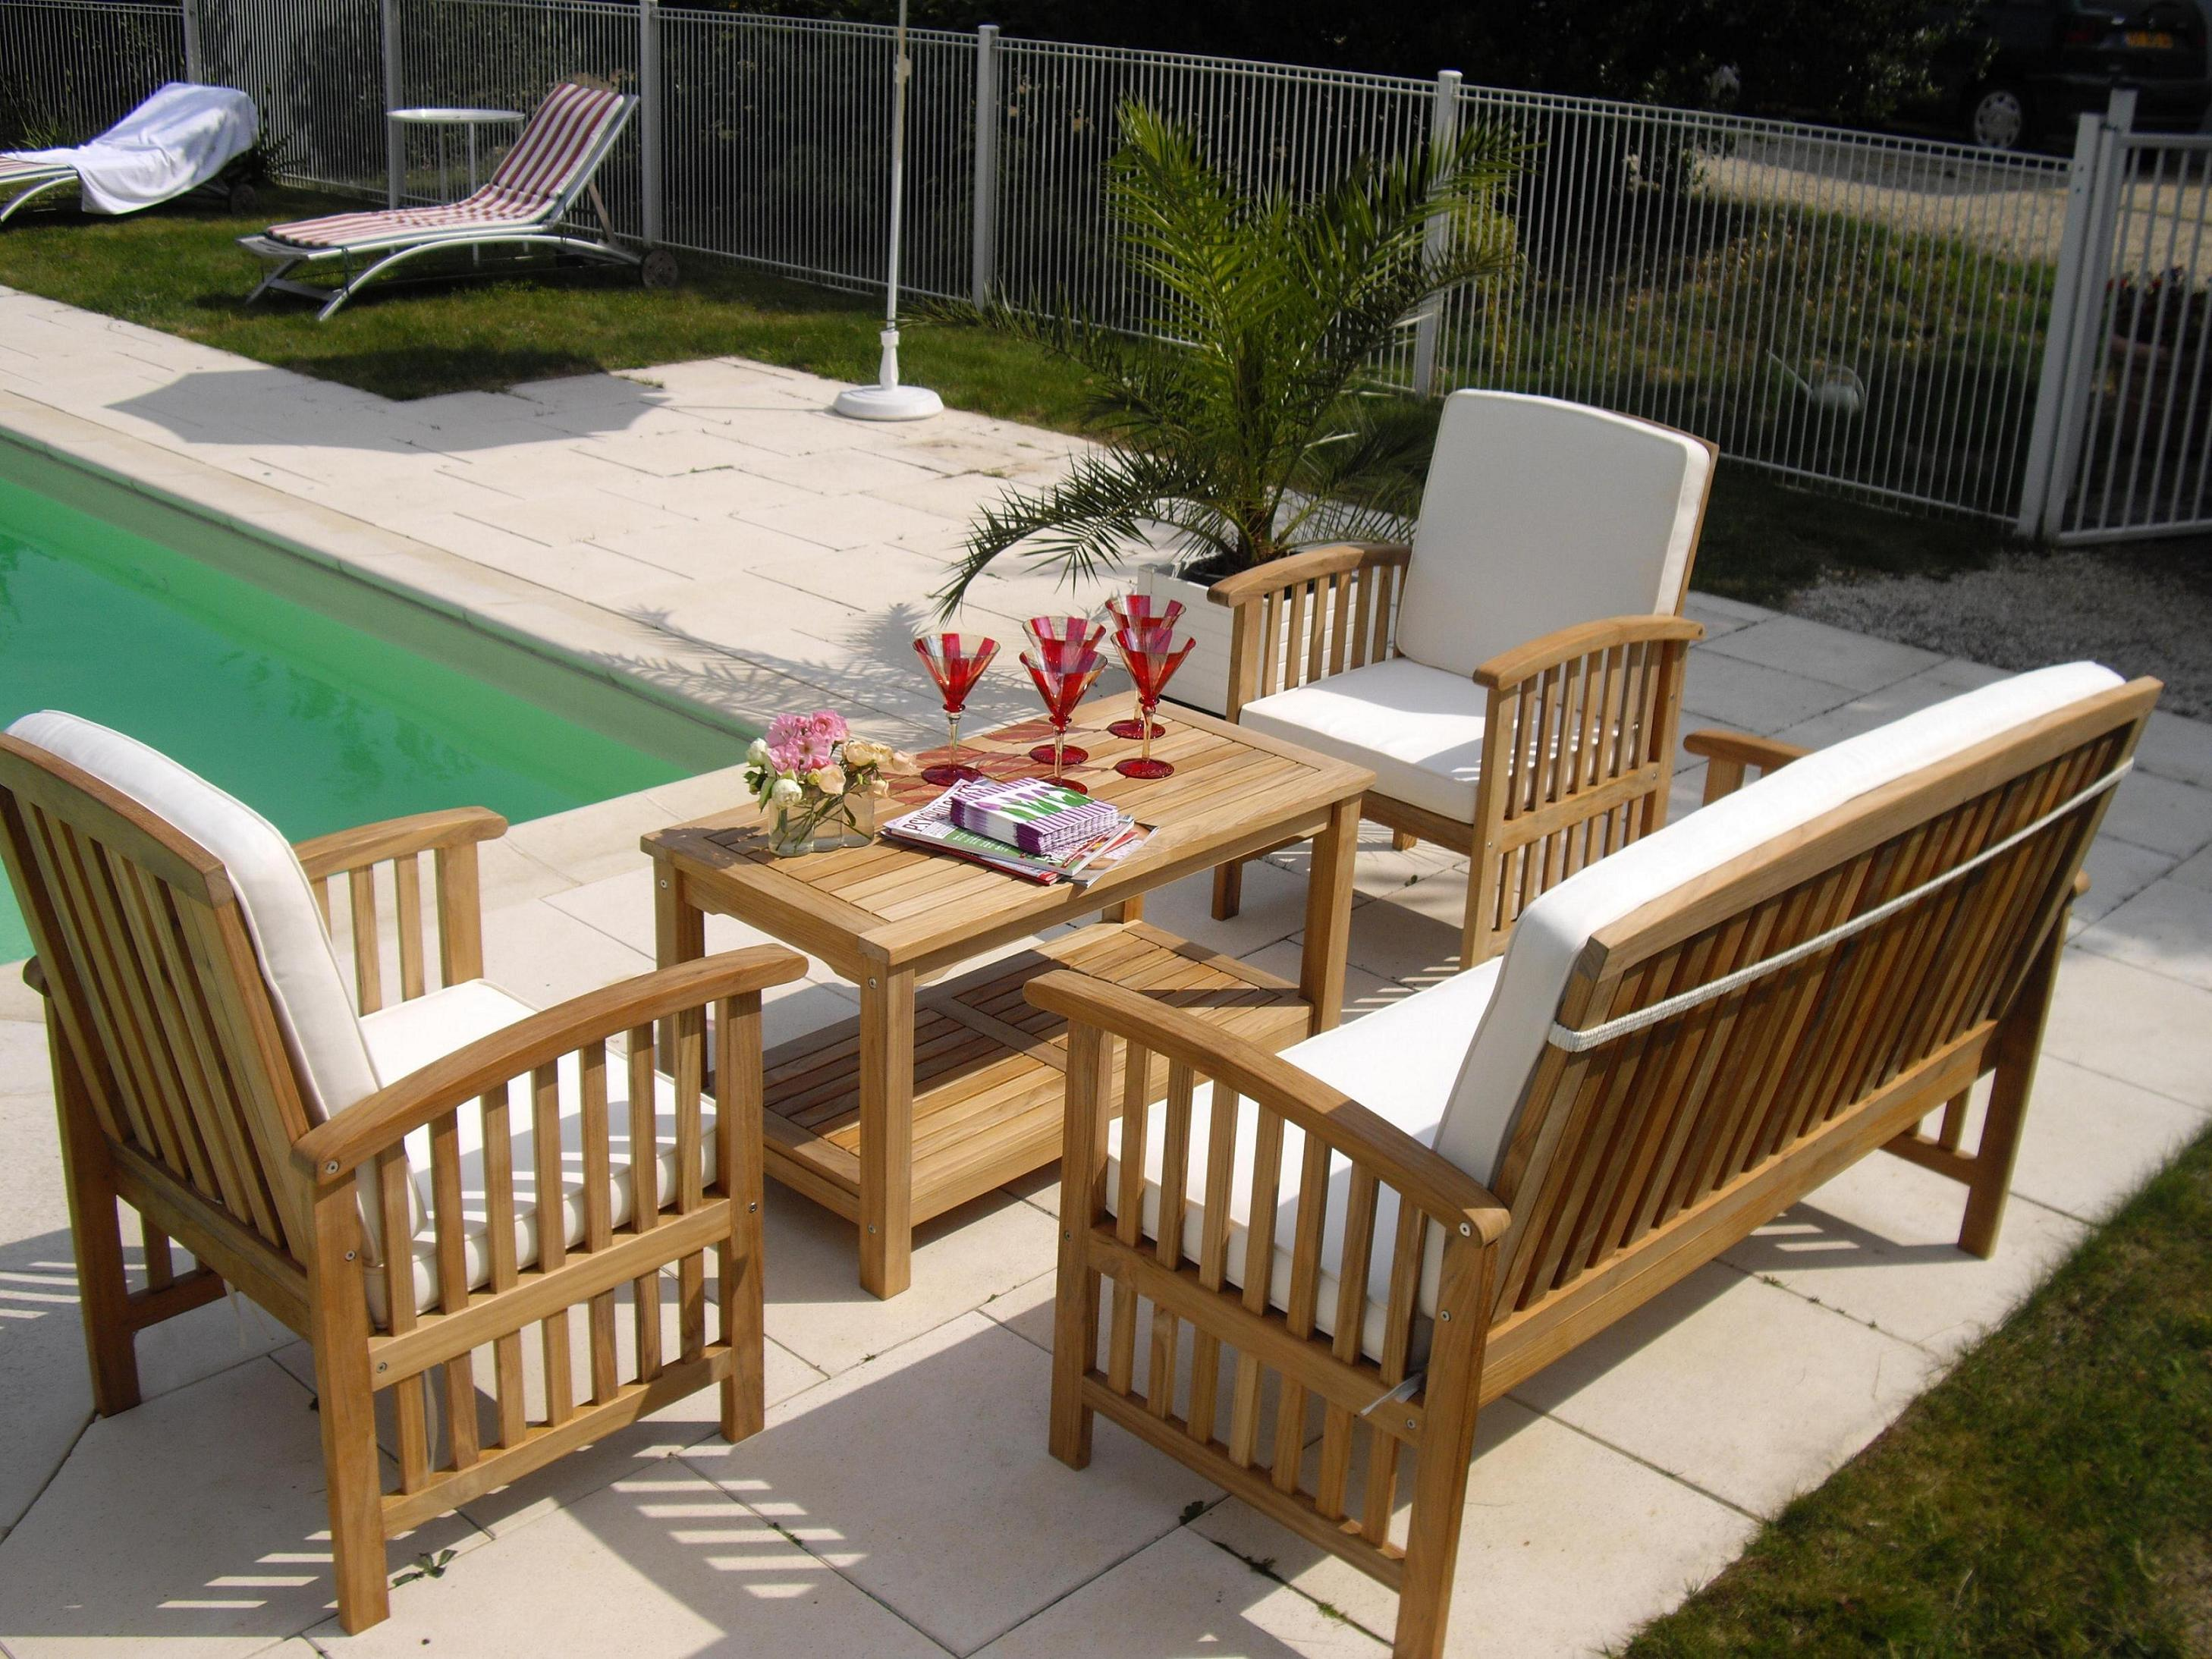 Salon de jardin en bois bas - Mailleraye.fr jardin